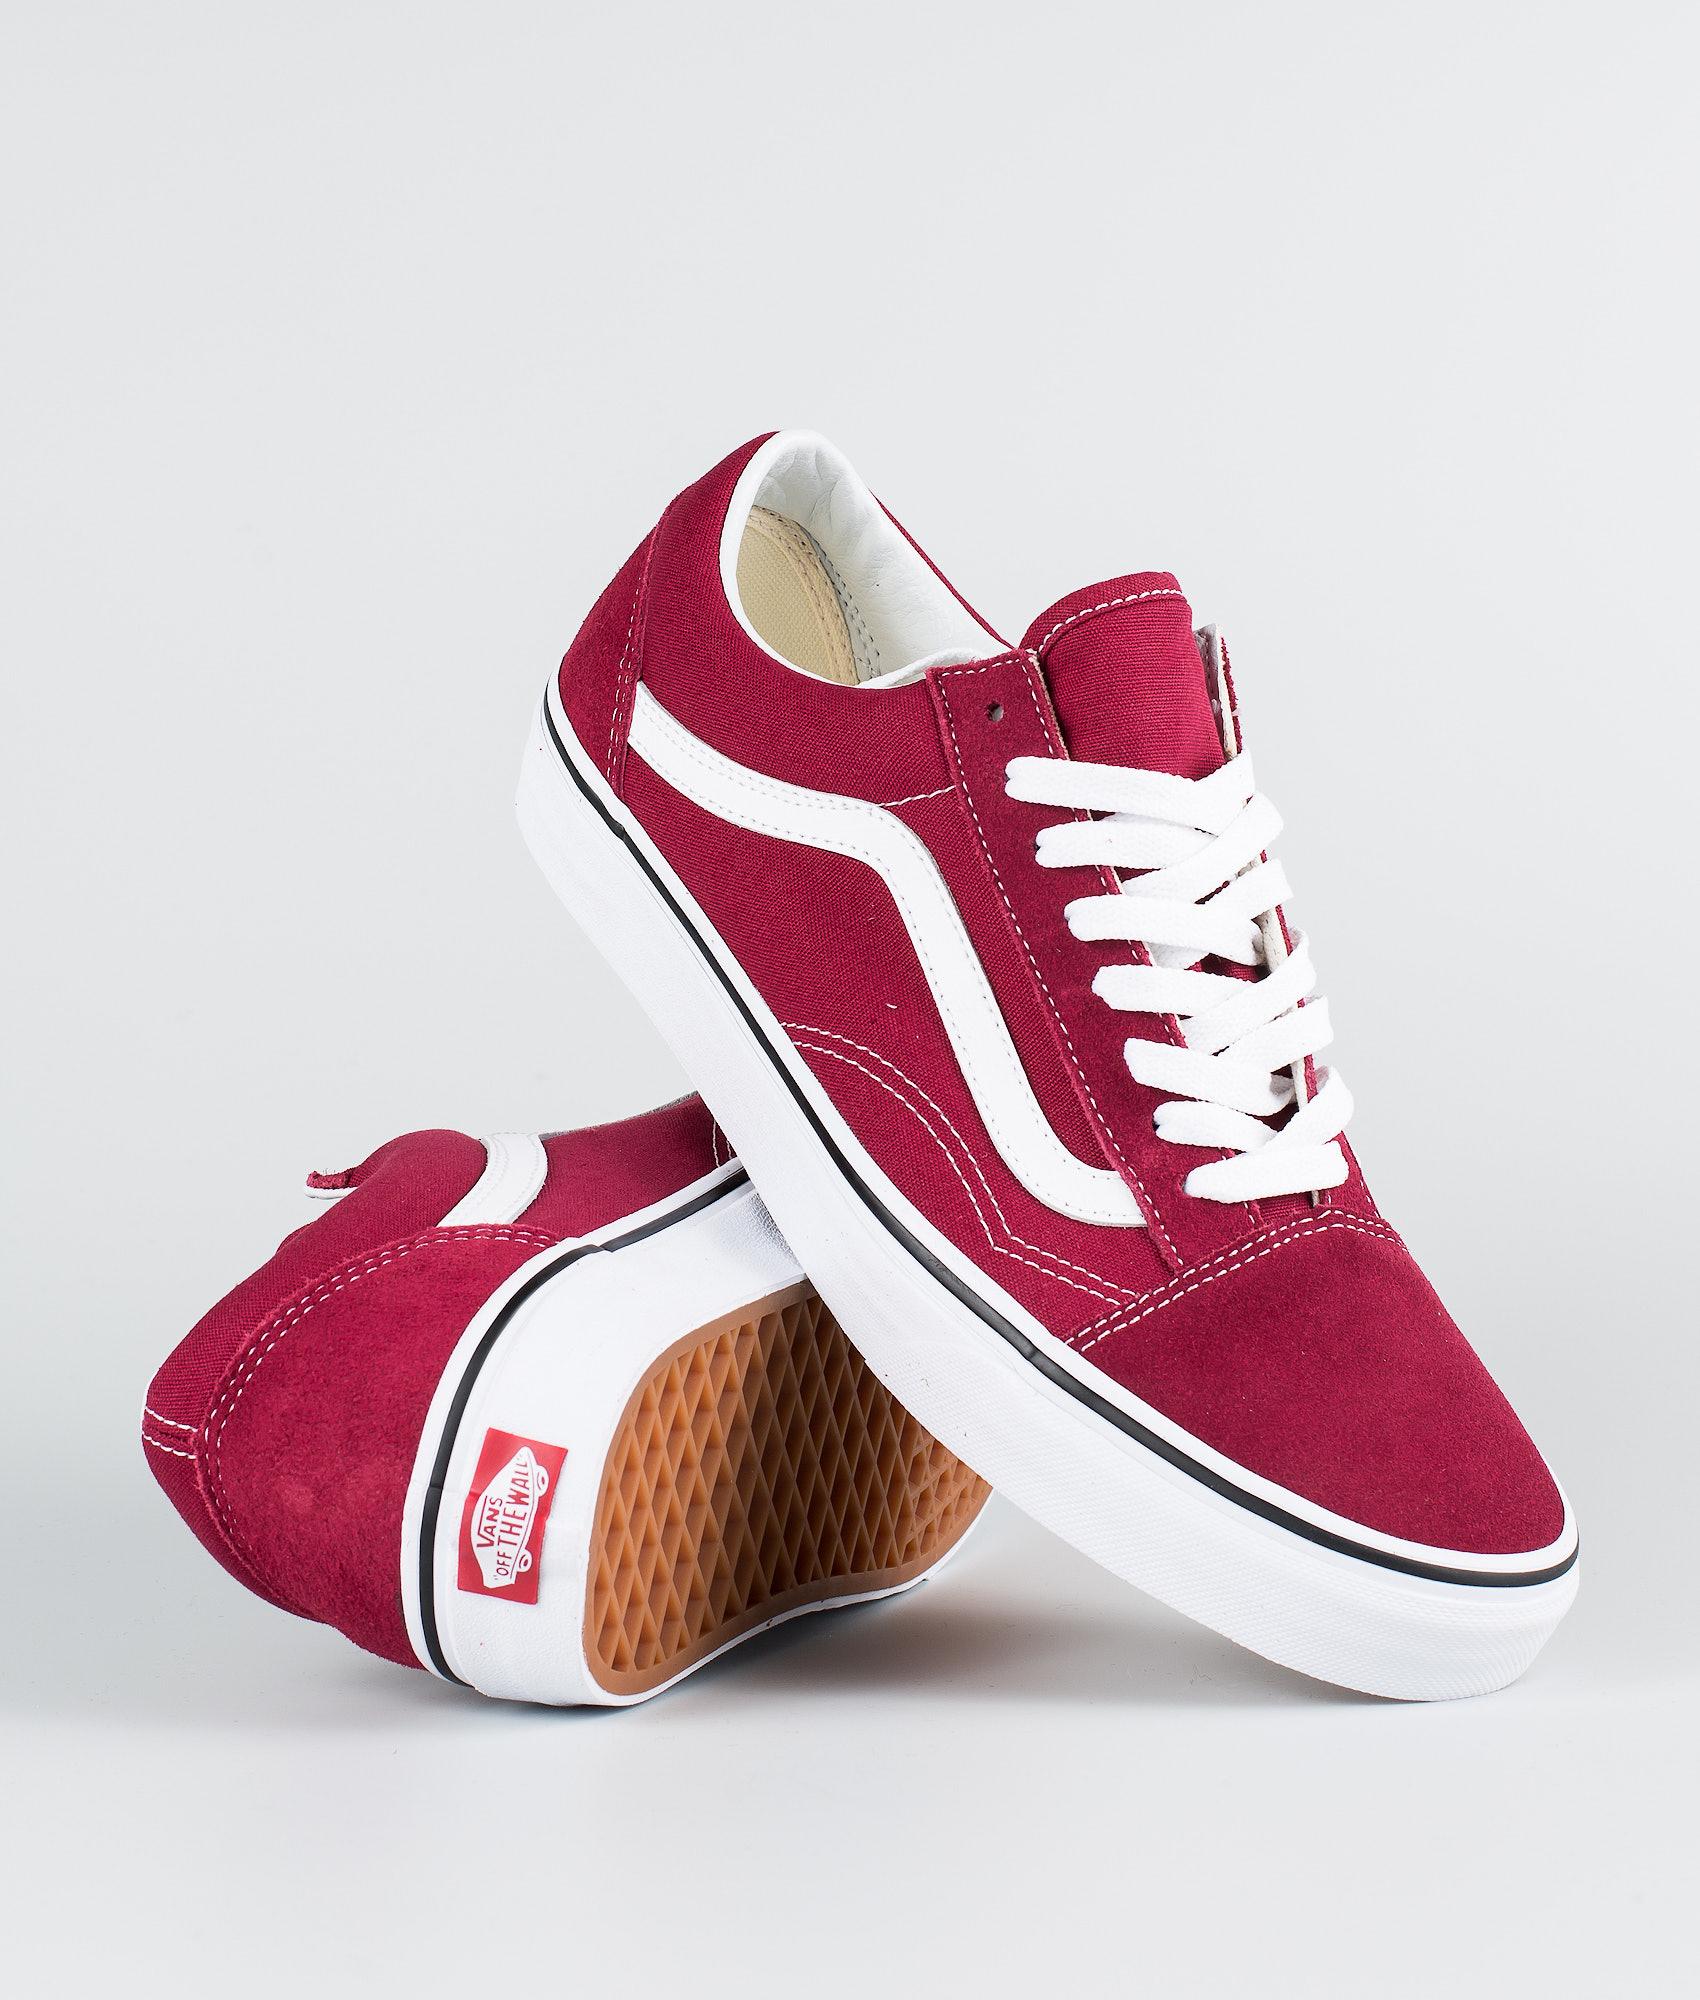 Vans Old Skool Shoes Rumba Red True White - Ridestore.com 648b7b1ae8